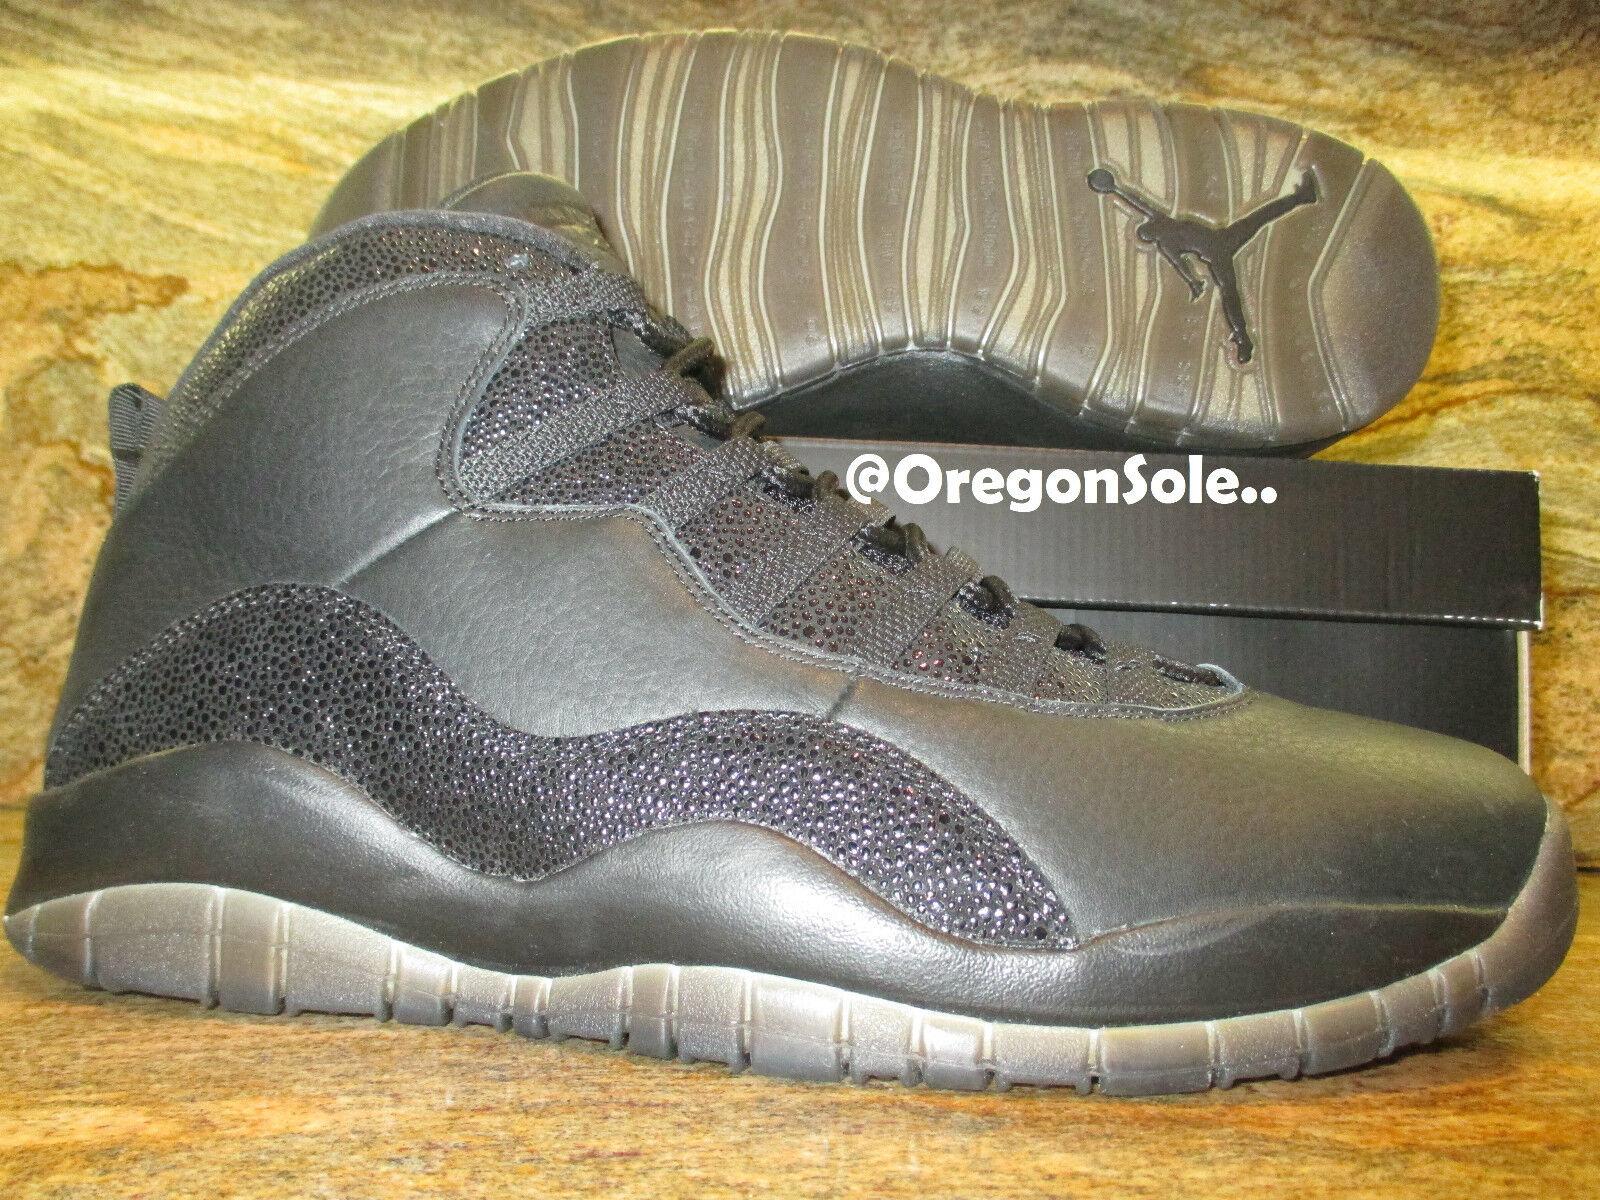 Nike Air Jordan 10 Sample X Retro OVO Promo Sample 10 SZ 13.5 Black Gold Drake PE HOF PSNY 583fdc